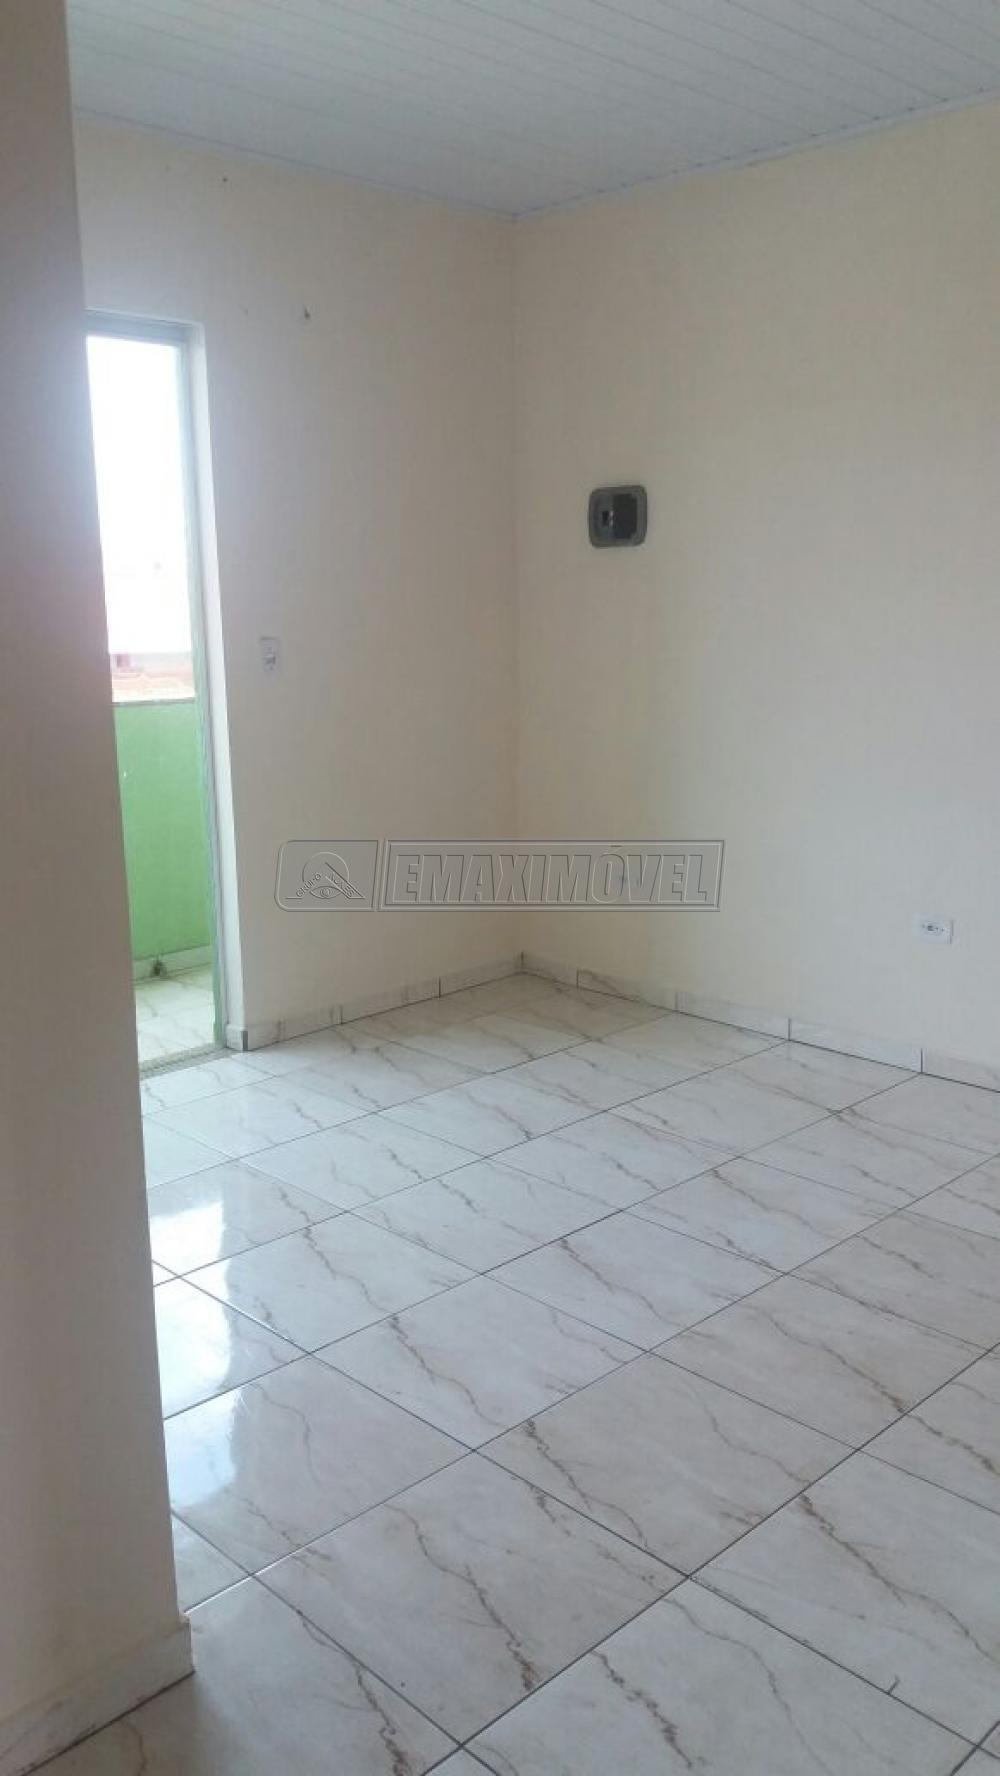 Comprar Comercial / Prédios em Sorocaba R$ 950.000,00 - Foto 5